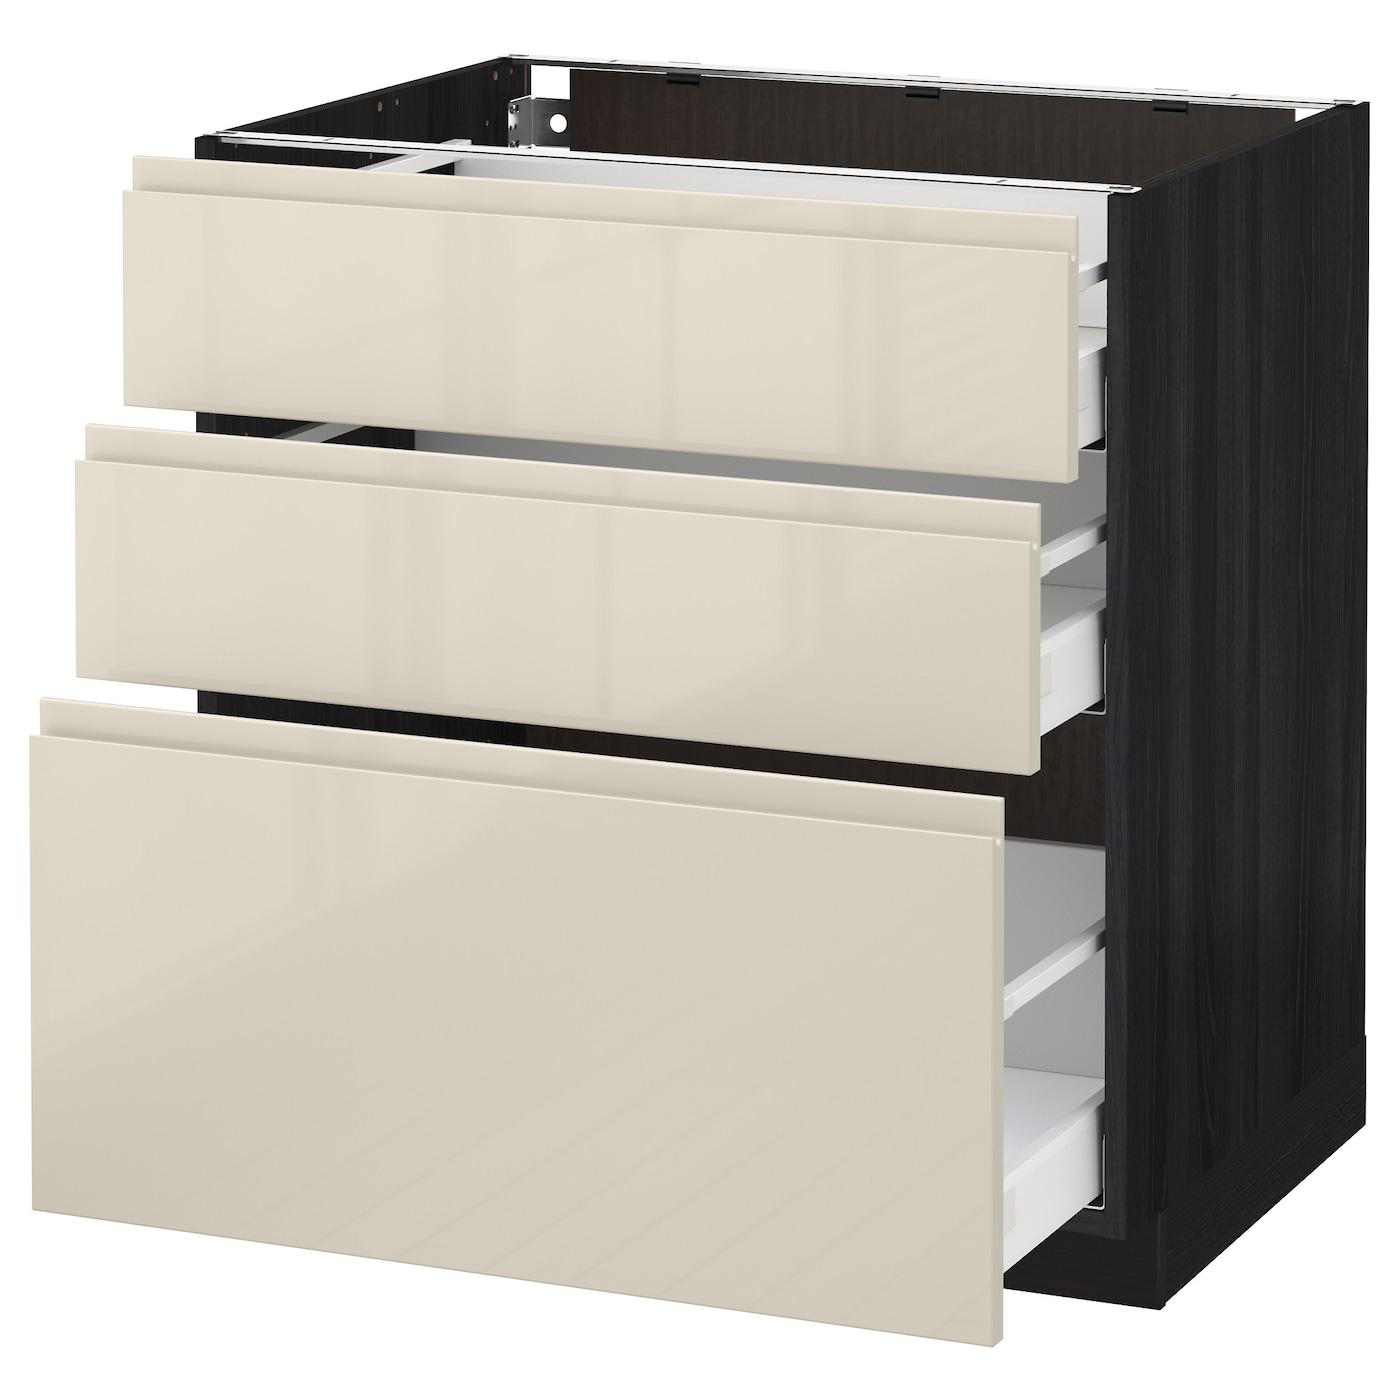 metod maximera base cabinet with 3 drawers black voxtorp high gloss light beige 80 x 60 cm ikea. Black Bedroom Furniture Sets. Home Design Ideas